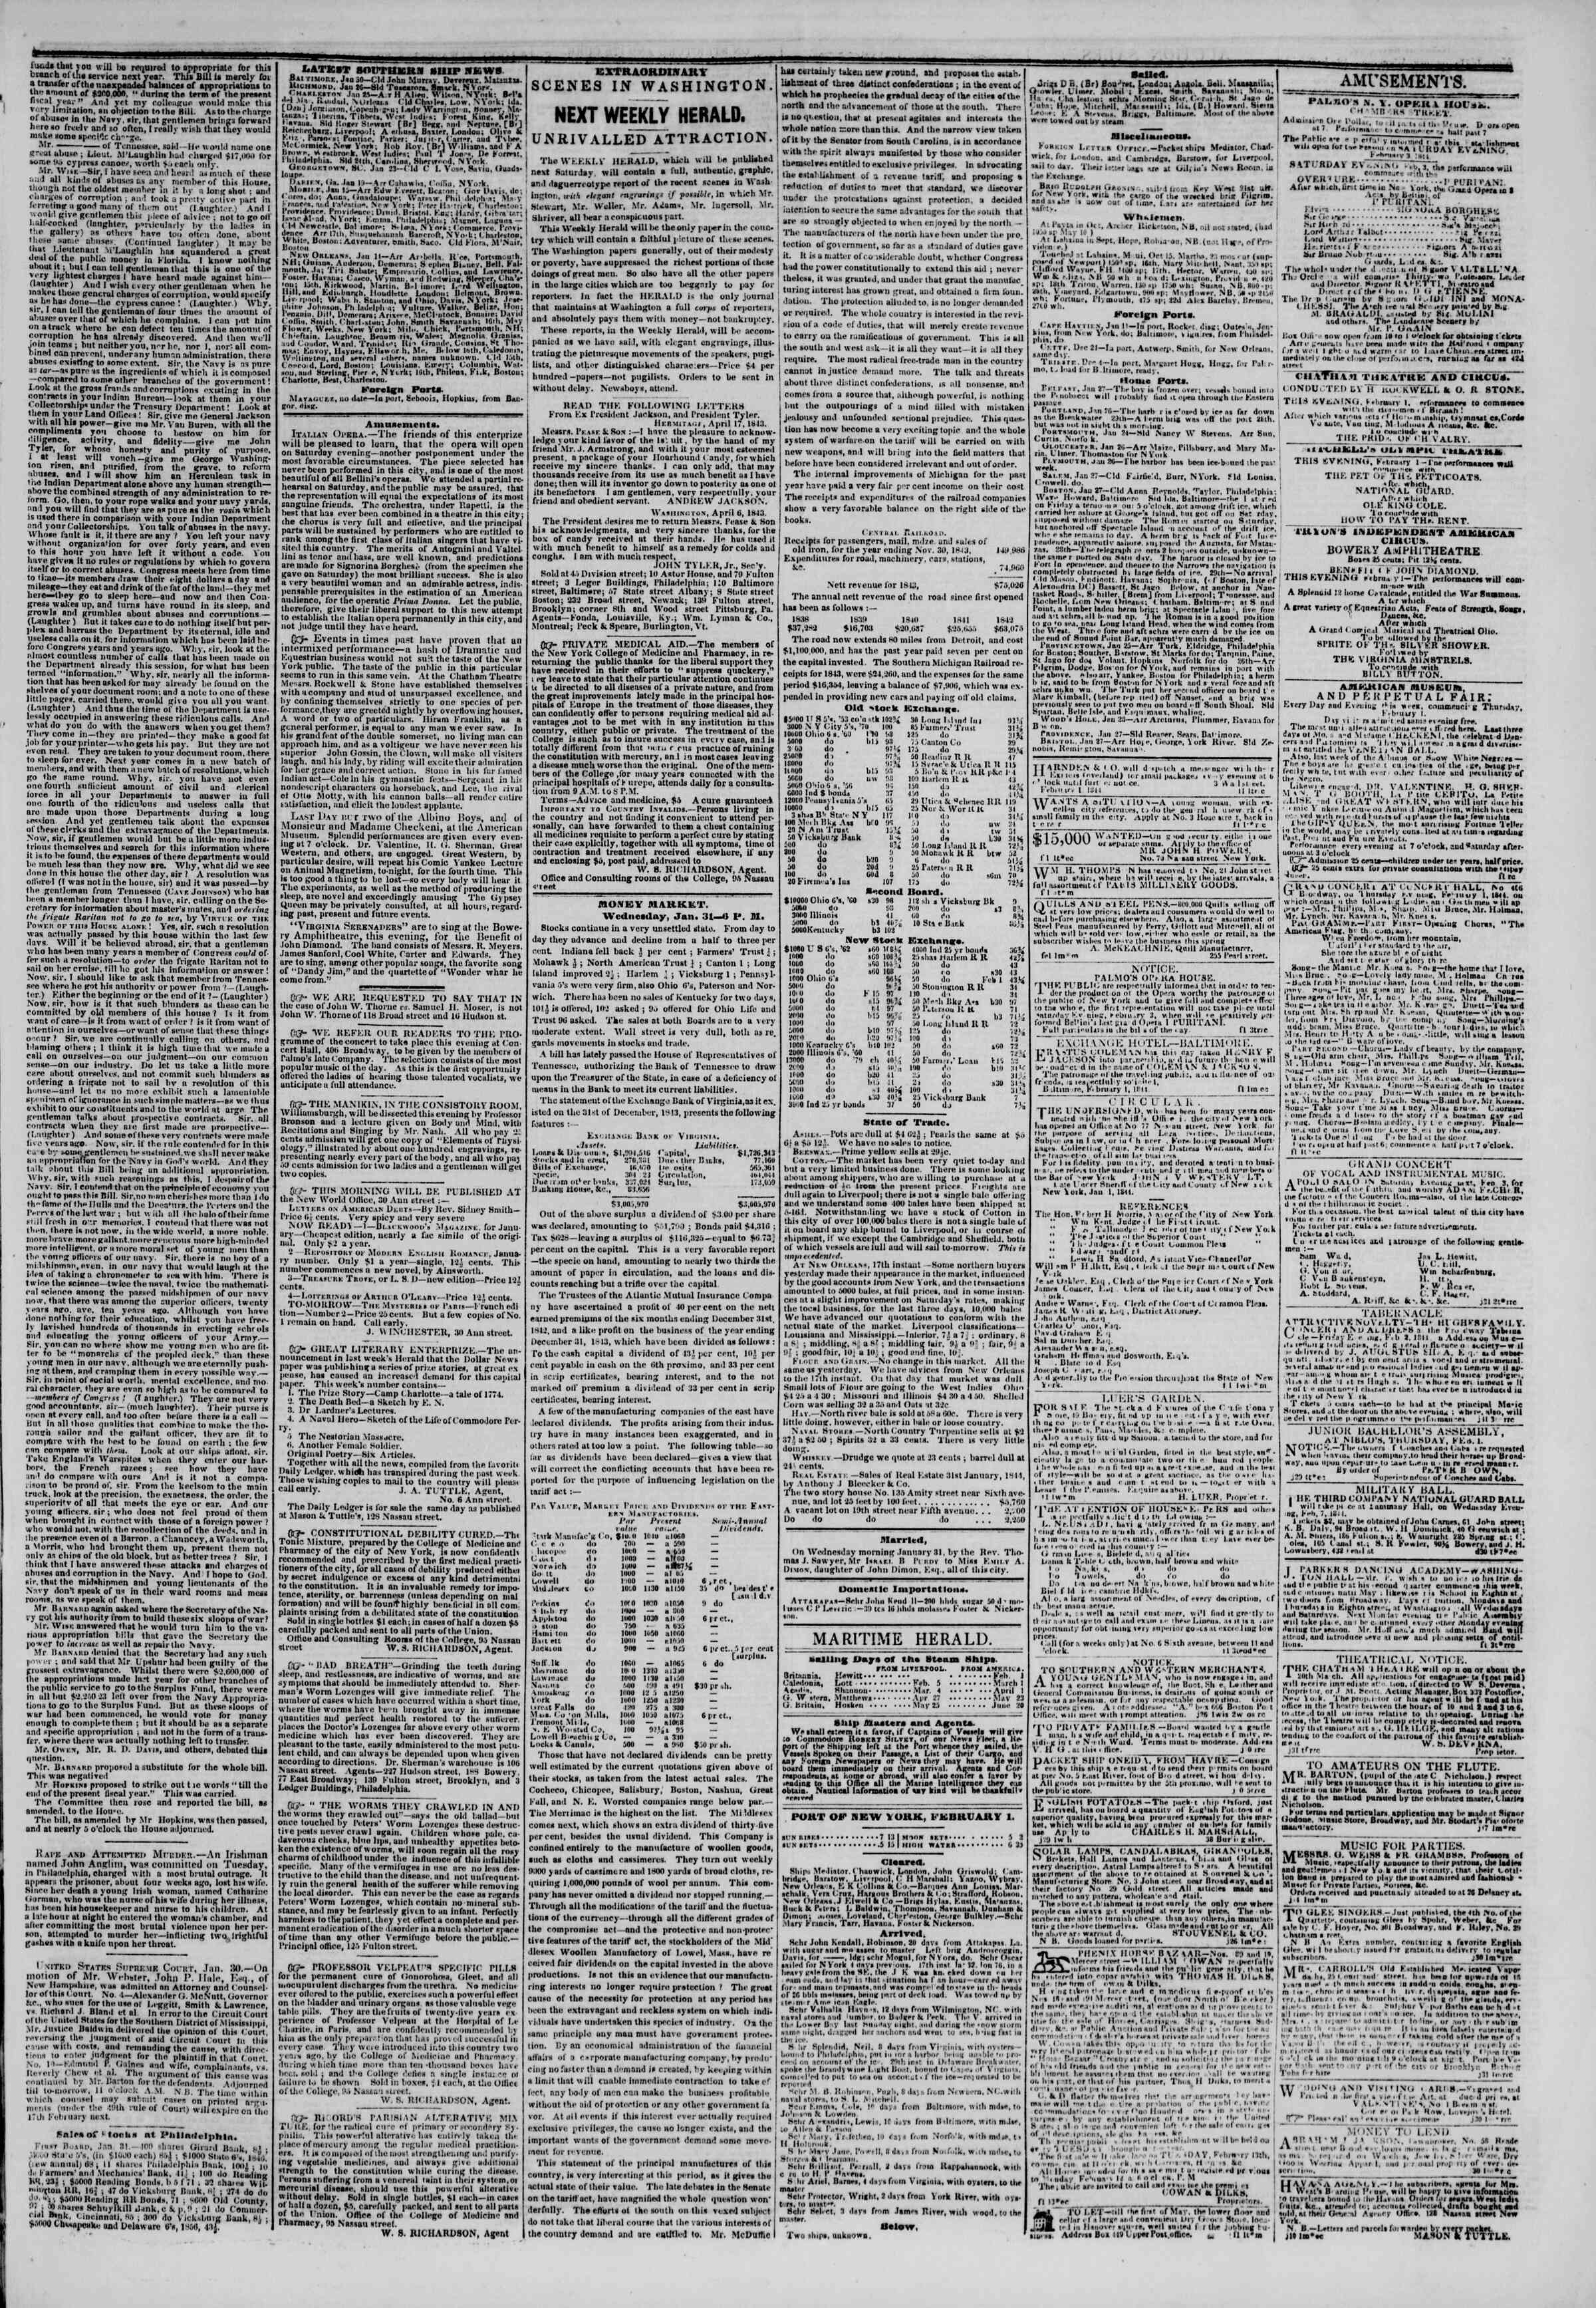 February 1, 1844 Tarihli The New York Herald Gazetesi Sayfa 3